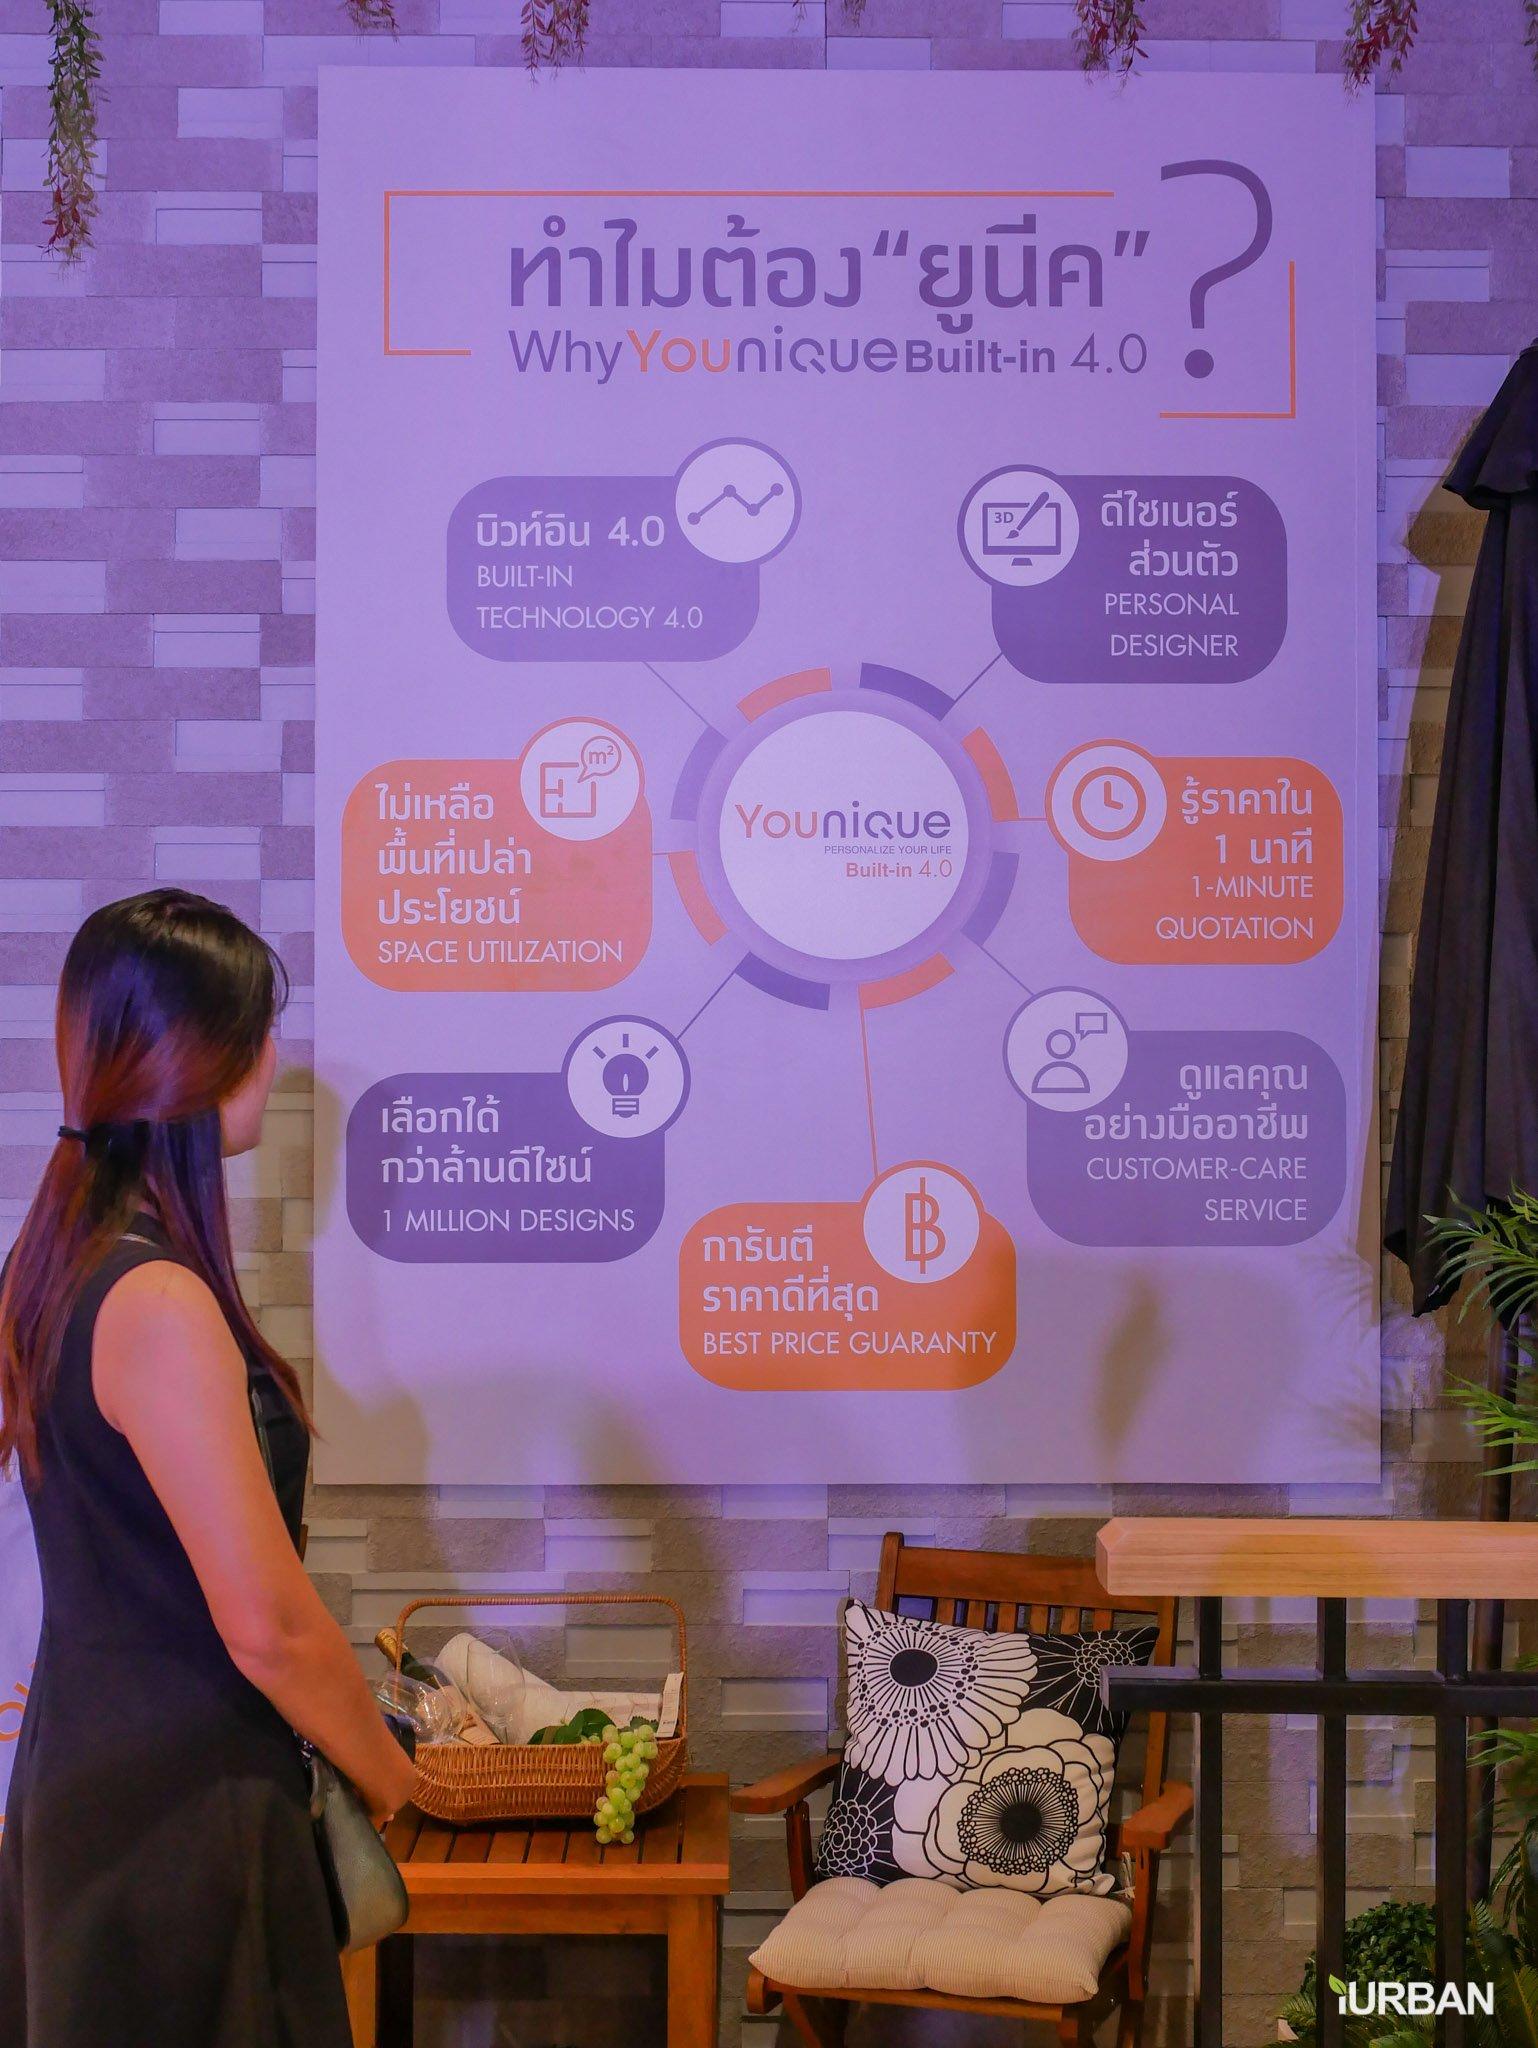 Younique เทคโนโลยีบิวท์อิน 4.0 ครั้งแรกในไทย มีเป็นล้านดีไซน์ รู้ราคาใน 1 นาที โดย Index Livingmall 54 - Built-in